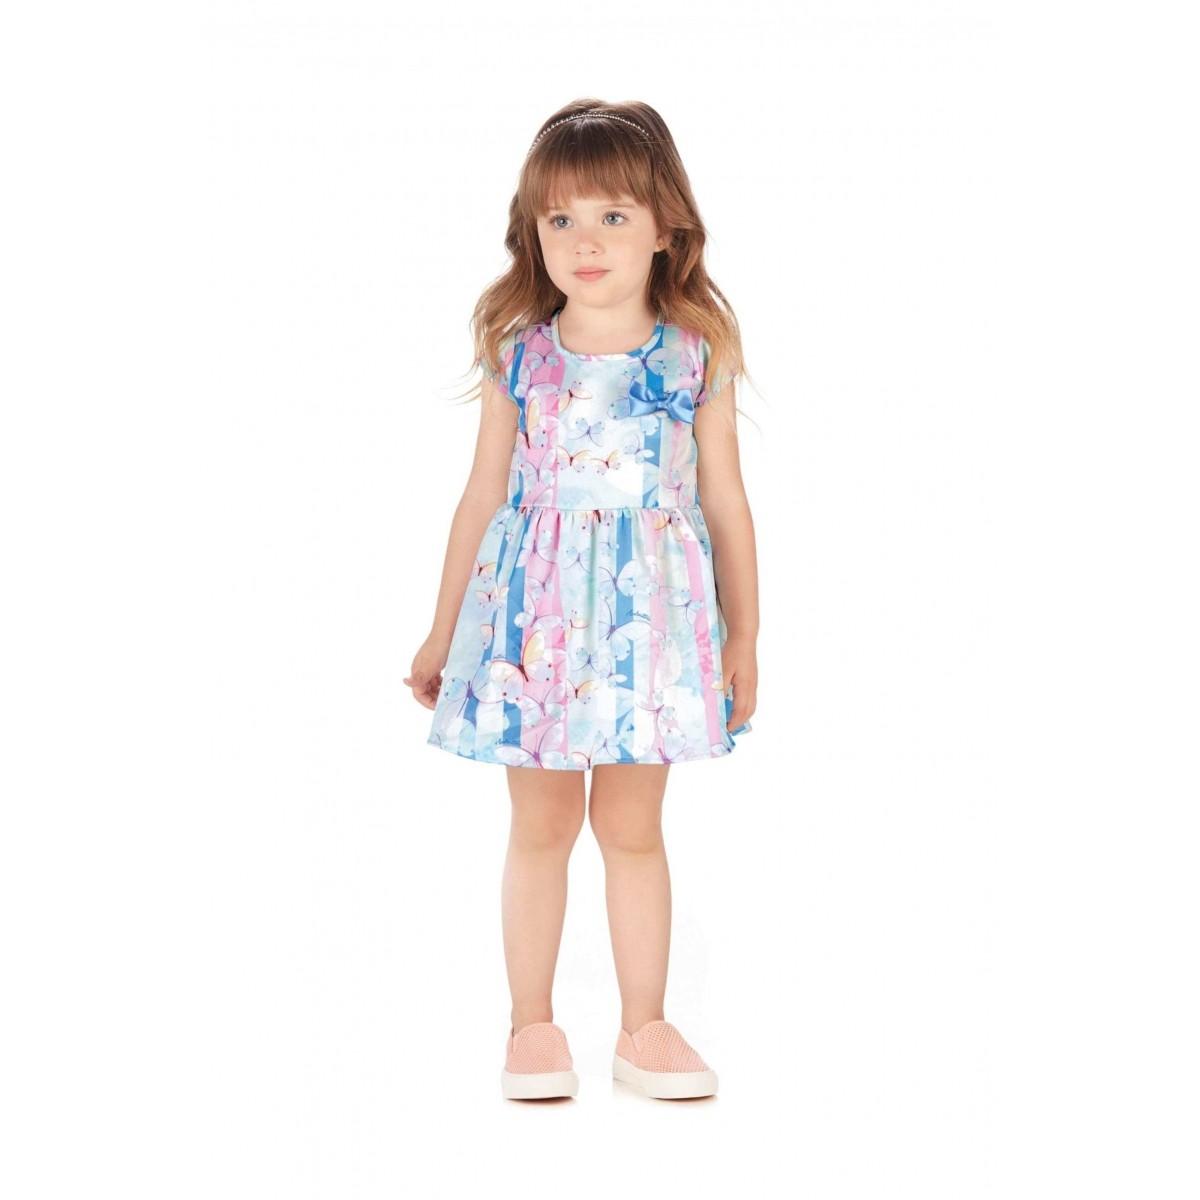 Vestido Infantil Azul Borboletas Colorittá · Vestido Infantil Azul  Borboletas Colorittá 404816f6dfa86